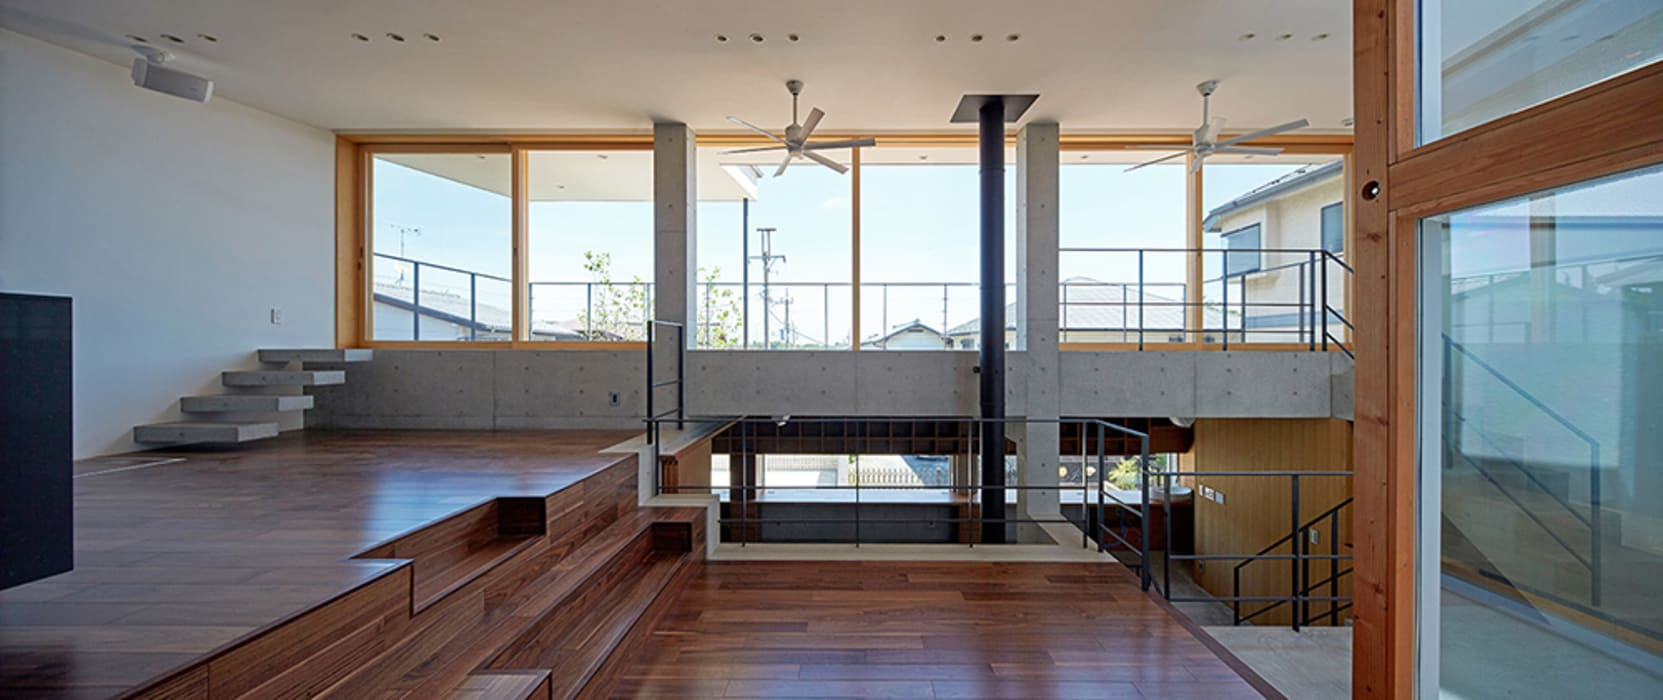 LDK モダンデザインの リビング の 株式会社小島真知建築設計事務所 / Masatomo Kojima Architects モダン